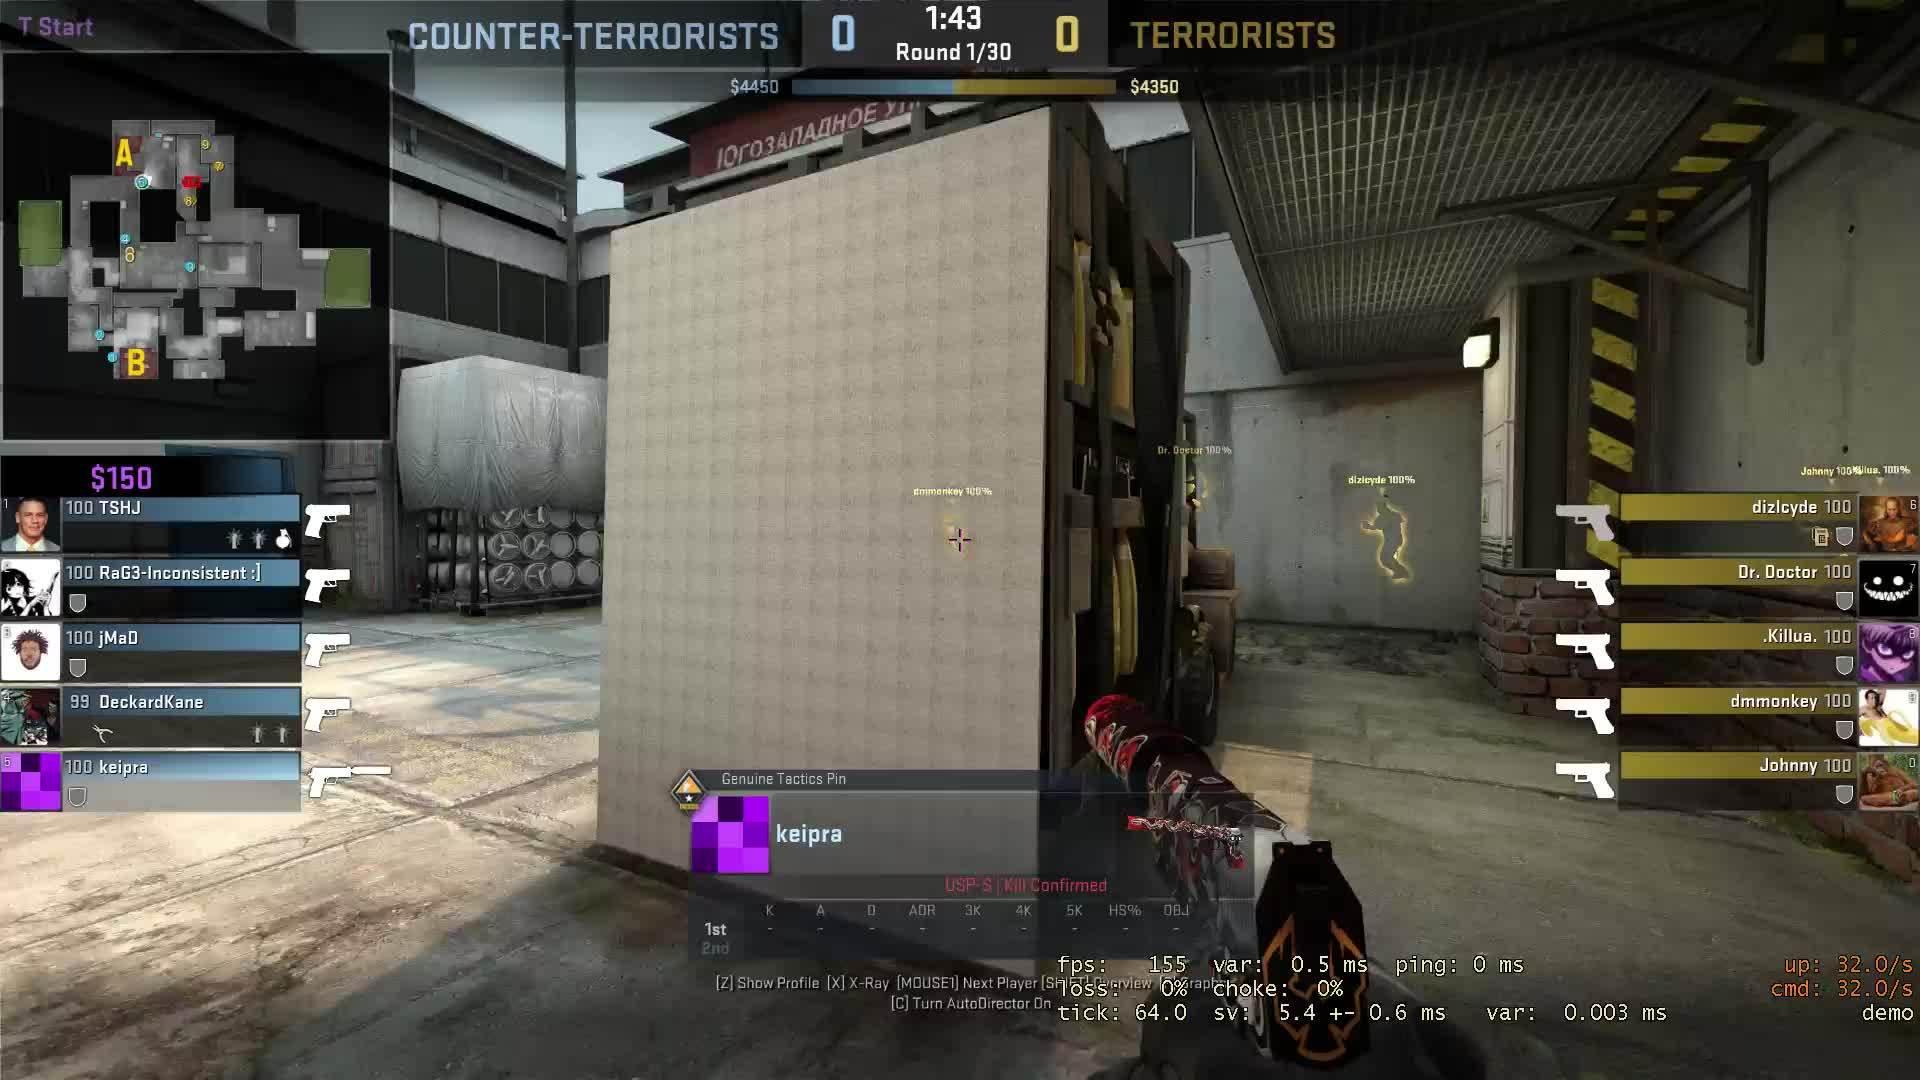 counterstrike, Pistol 4K HS GIFs